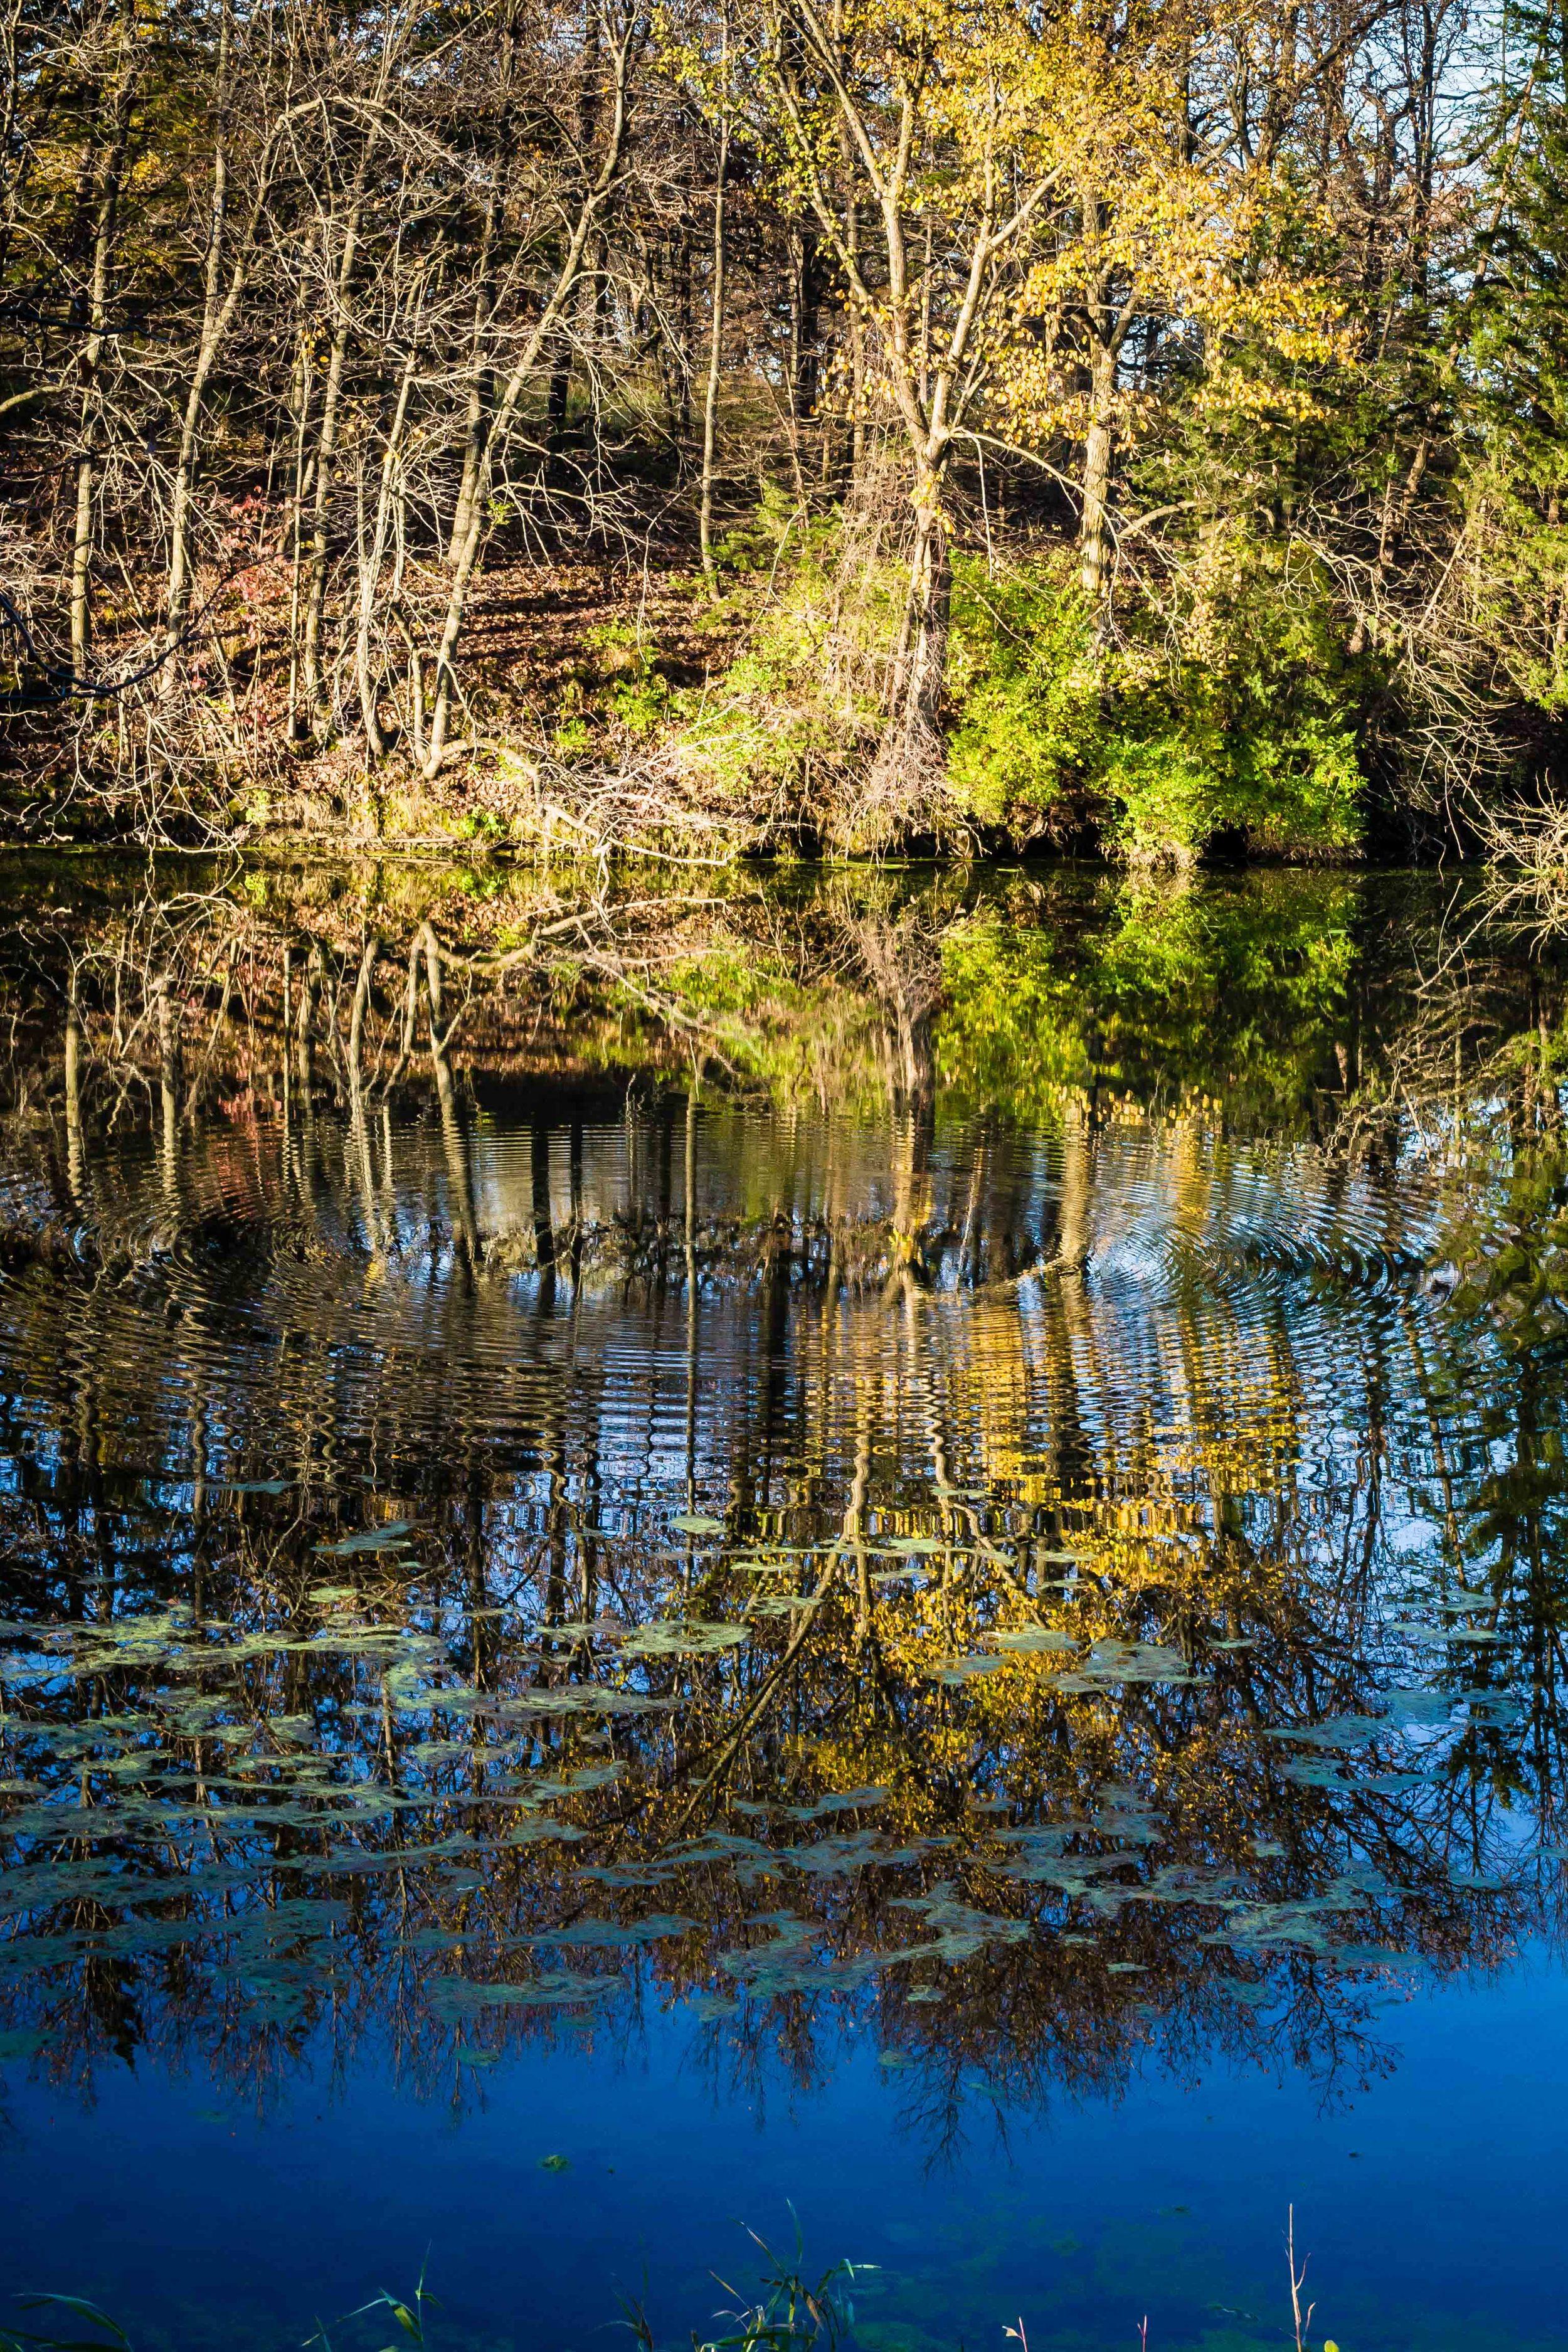 Reflections, McFarland Park, Story County, Iowa